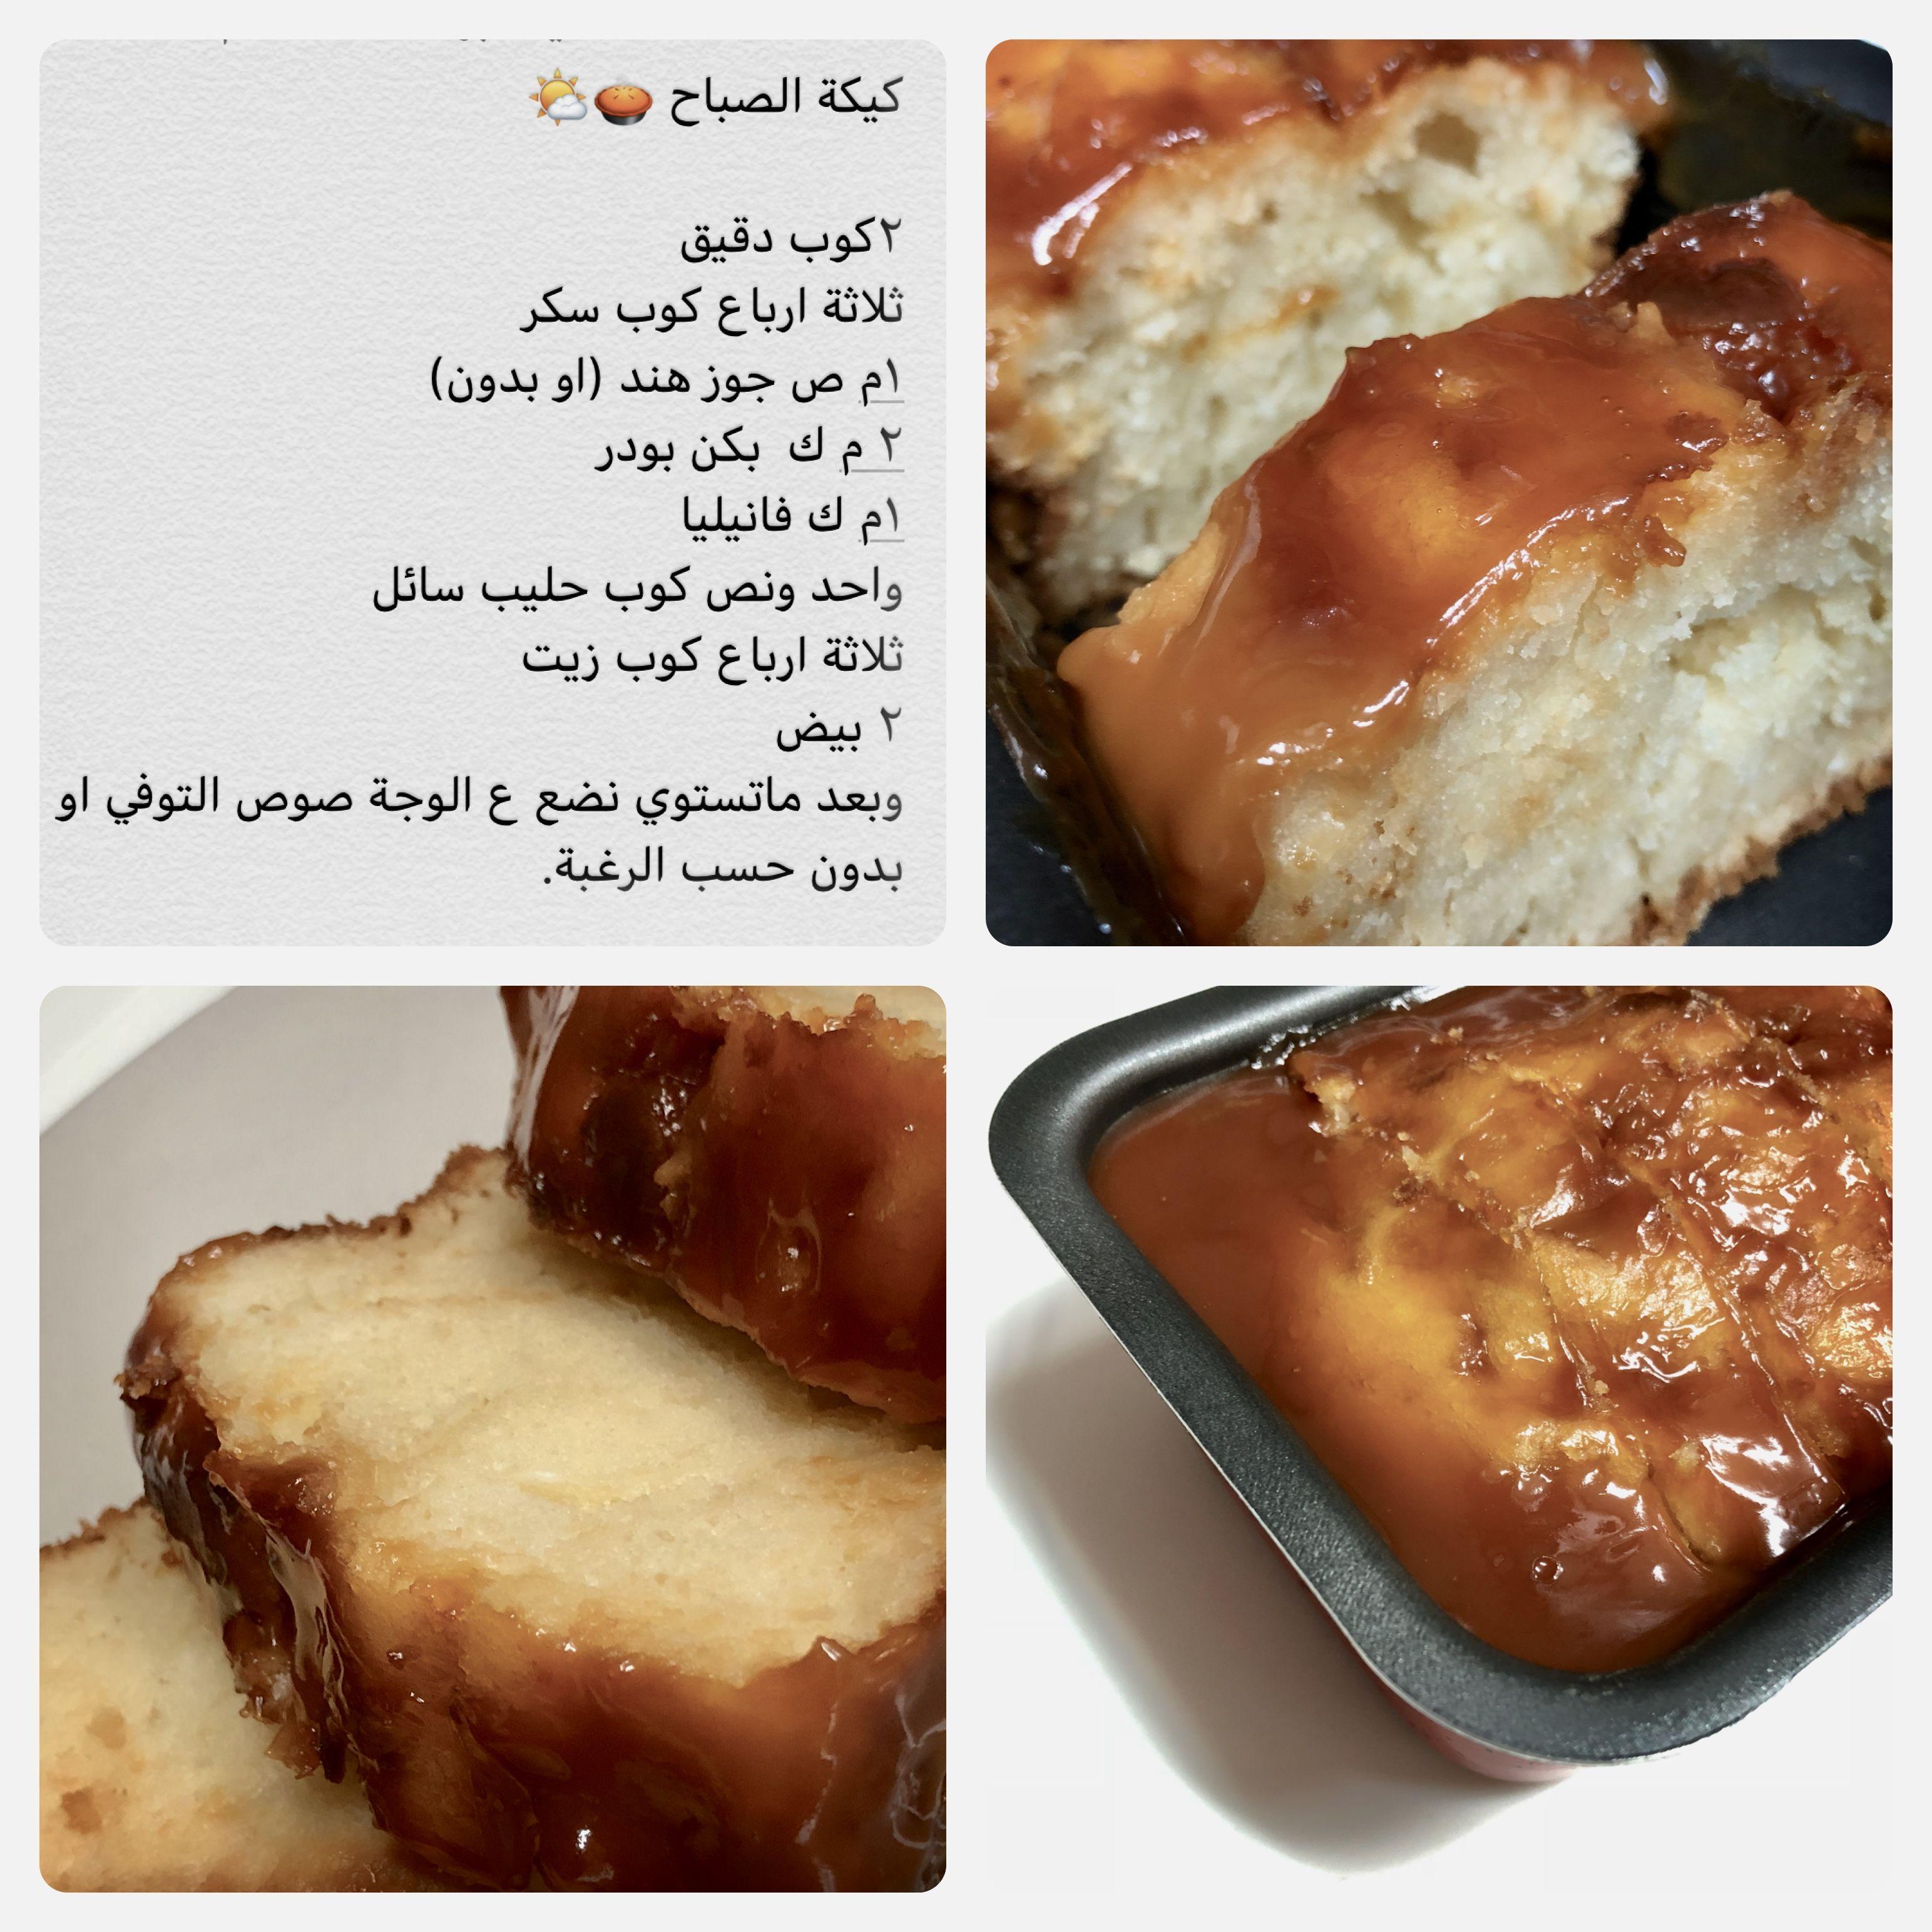 كيكة الصباح Cooking Recipes Desserts Sweets Recipes Food Recipies